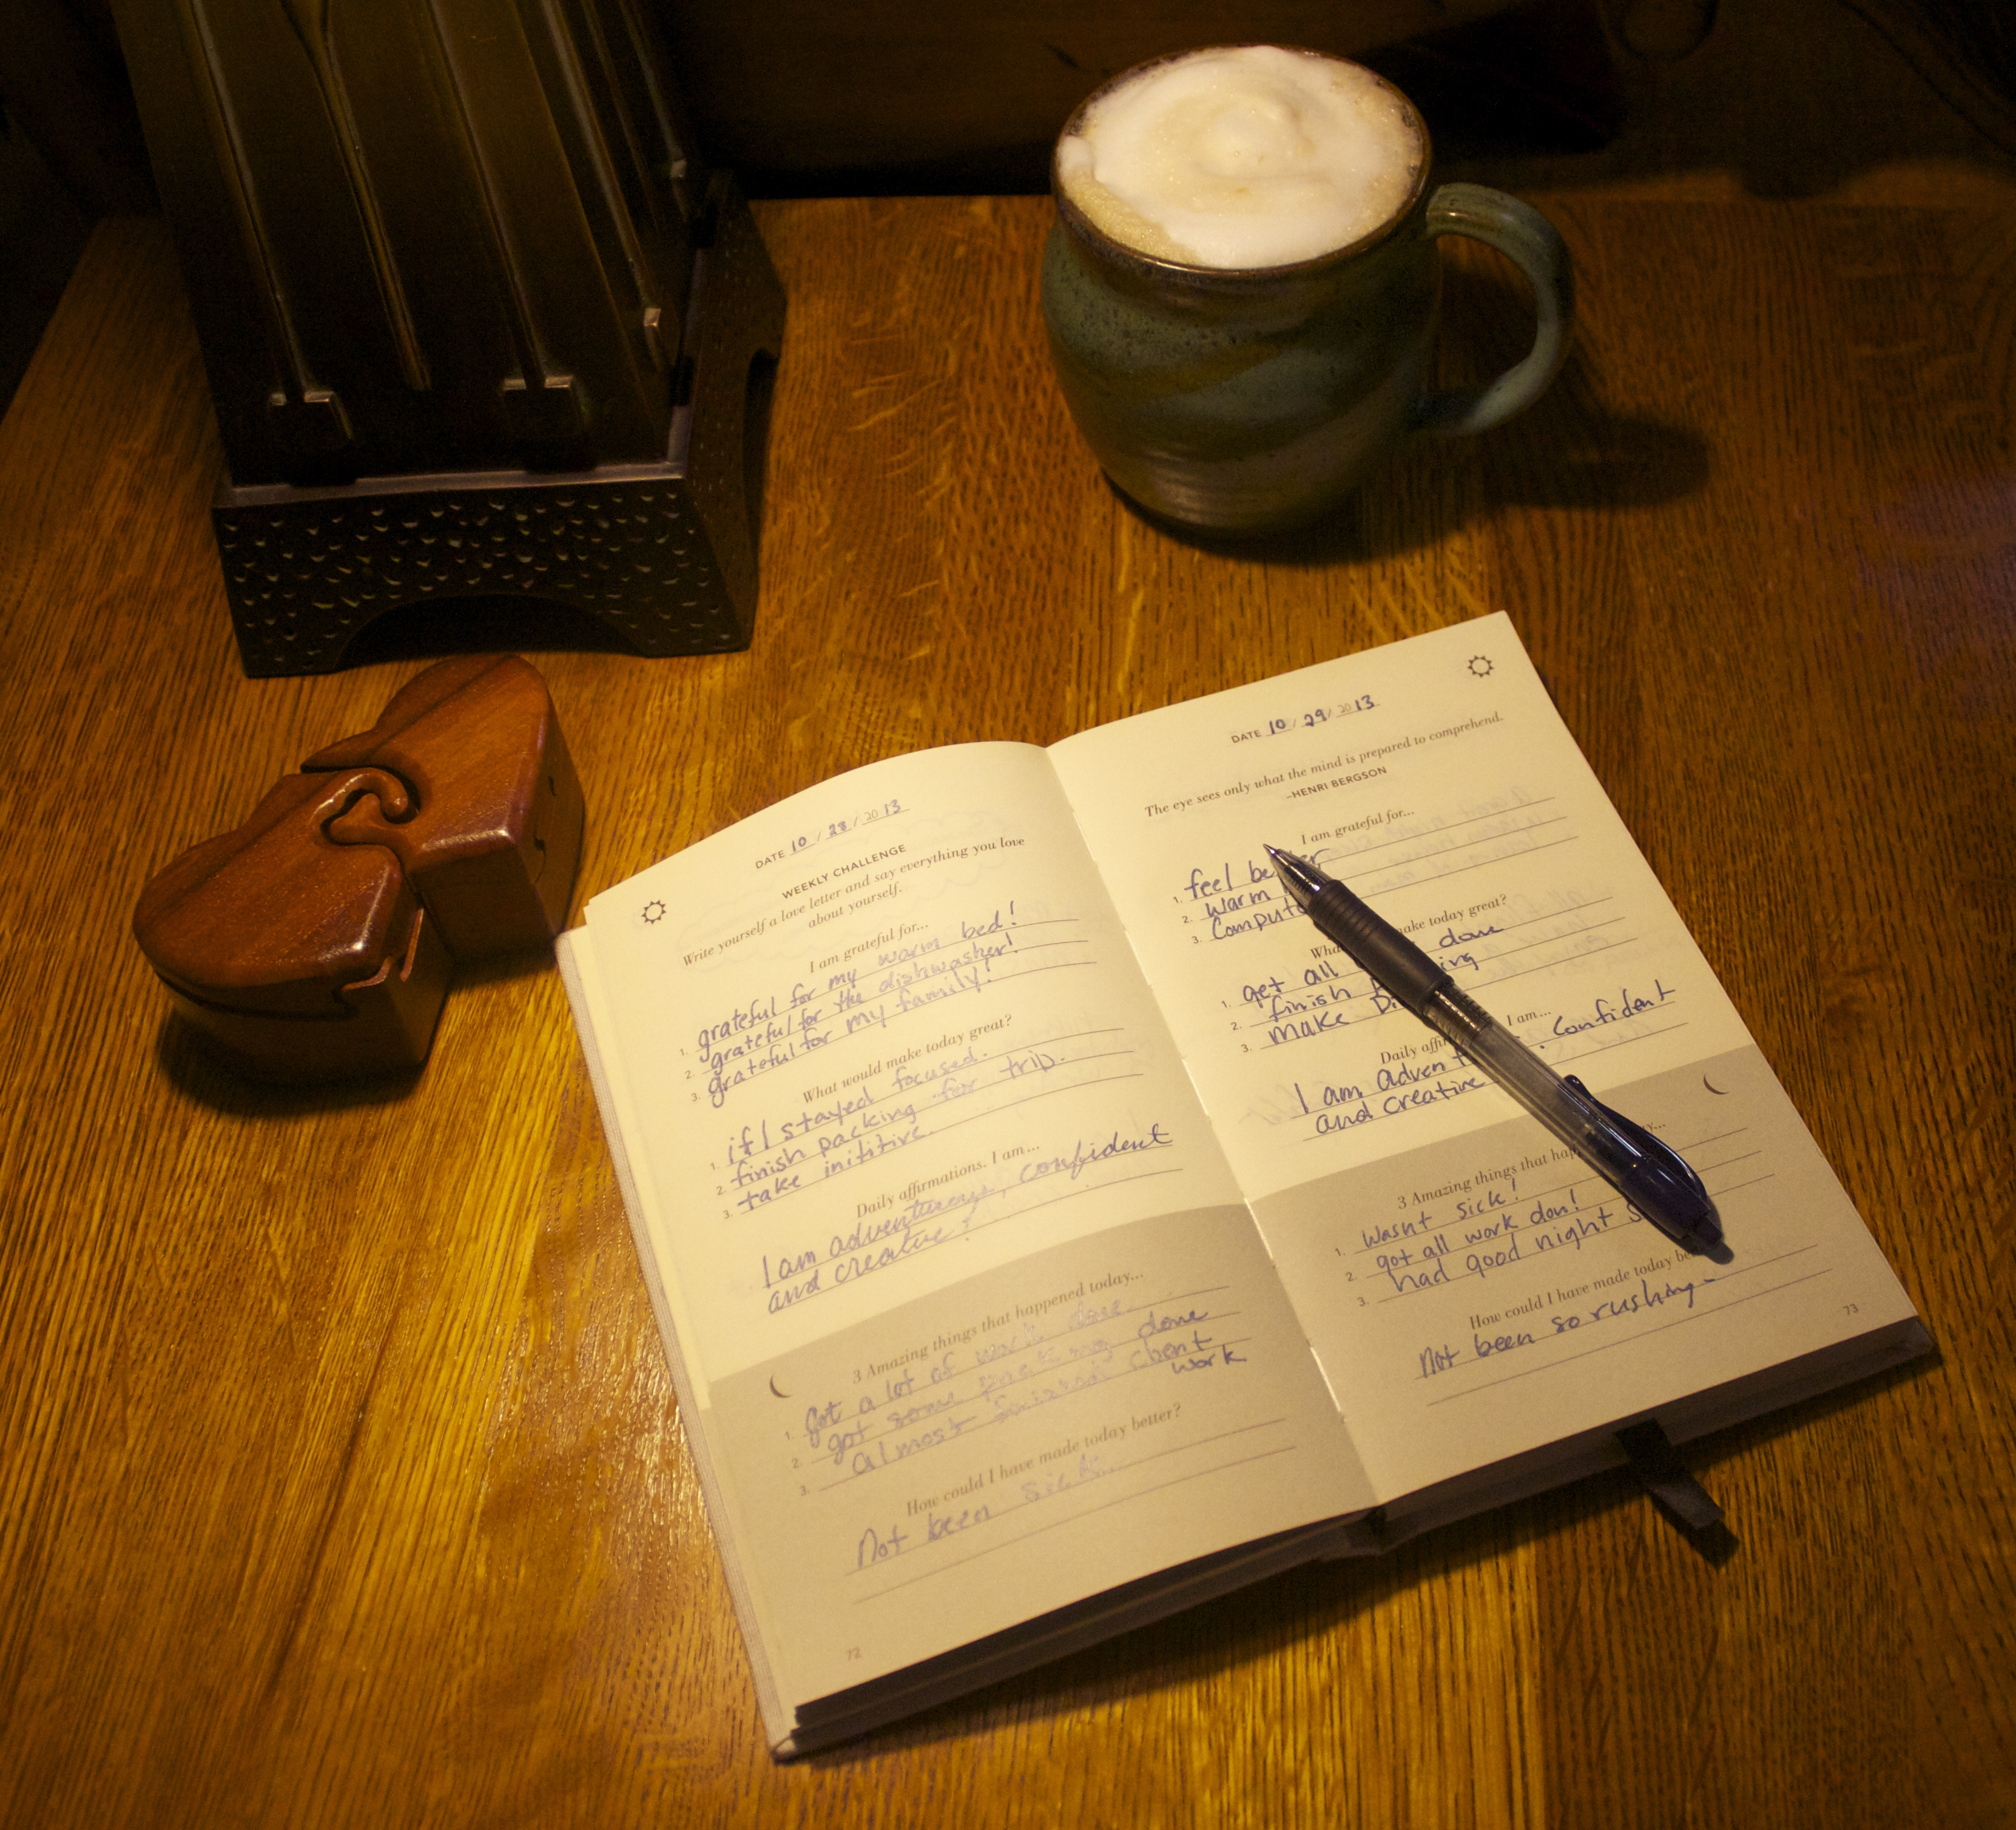 REVIEW The Five Minute Journal, journaling, journal, best journals, how to journal, gratitude, abundance, UJ Ramdas, Alex Ikonn, 5 Minute Journal, Best Boomers and Beyond, Baby Boomers,